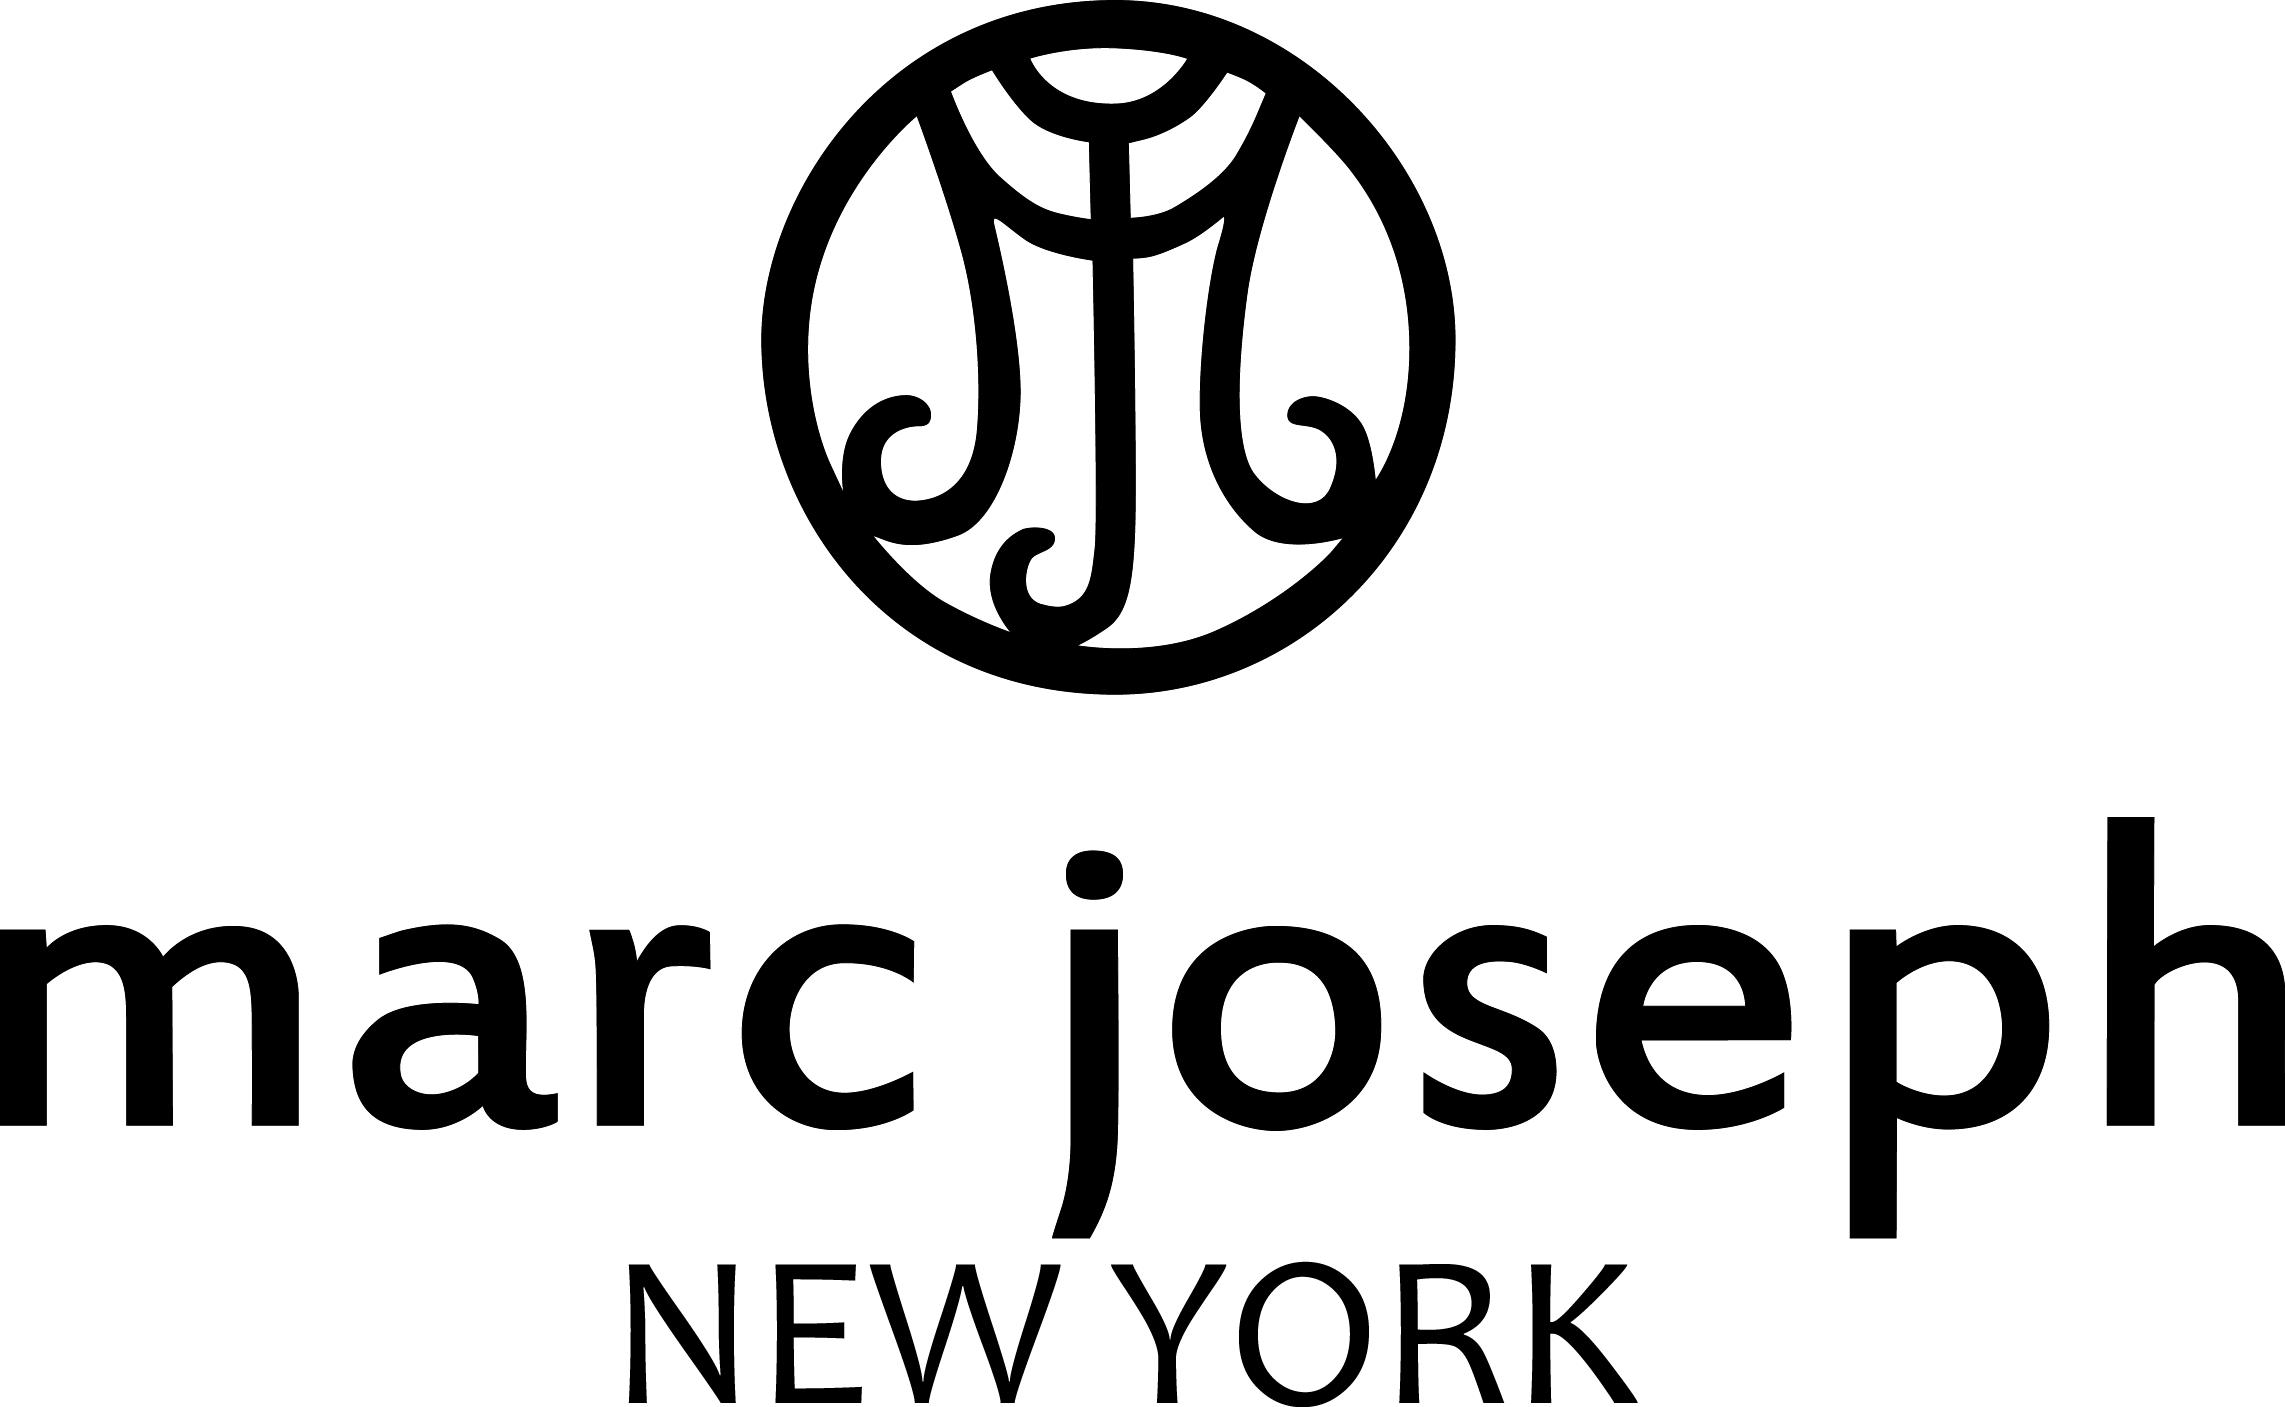 Marc_Joseph_New_York_logo_black